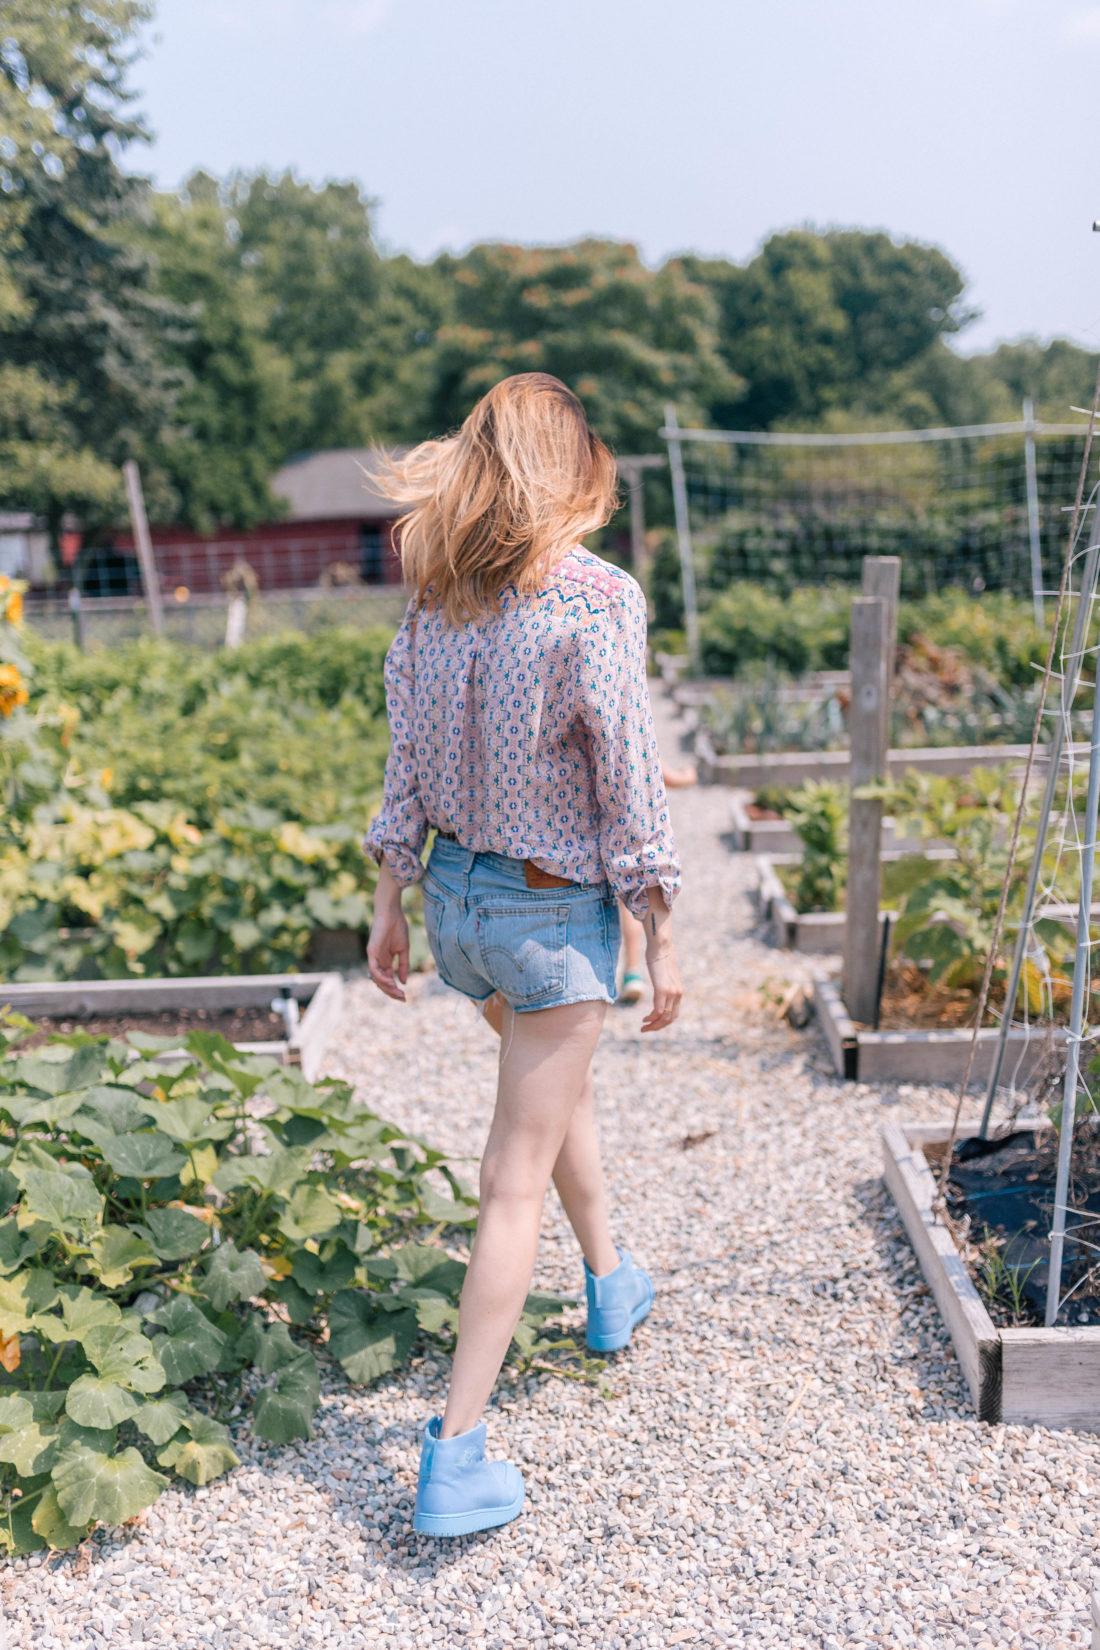 Eva Amurri Martino wears a silk blouse and denim cutoffs and walks through the vegetable garden of a local farm